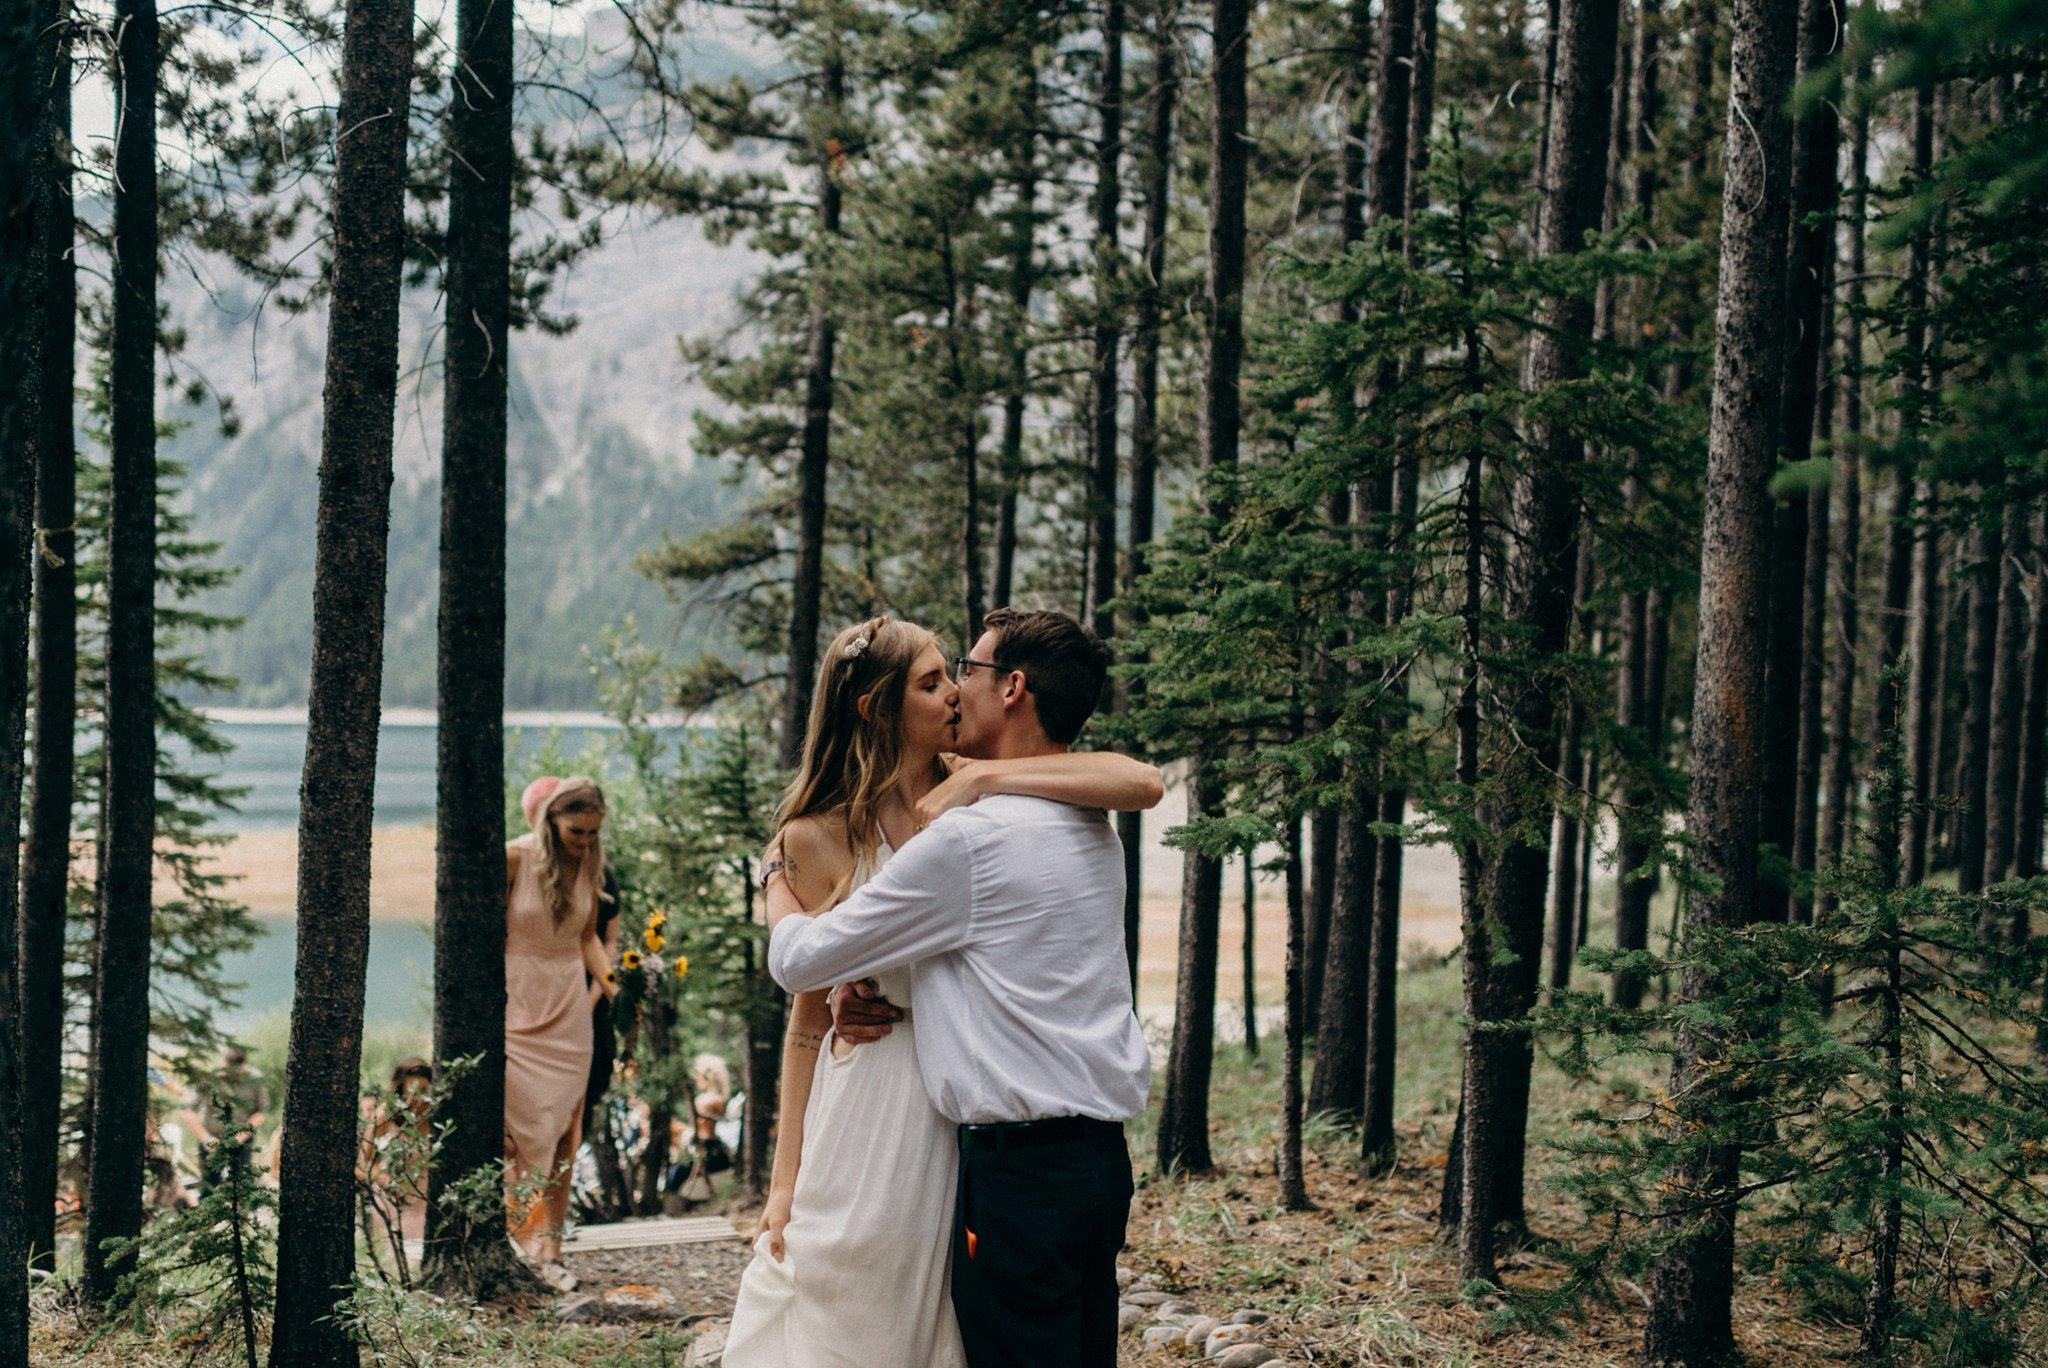 kaihla_tonai_intimate_wedding_elopement_photographer_6383.jpg